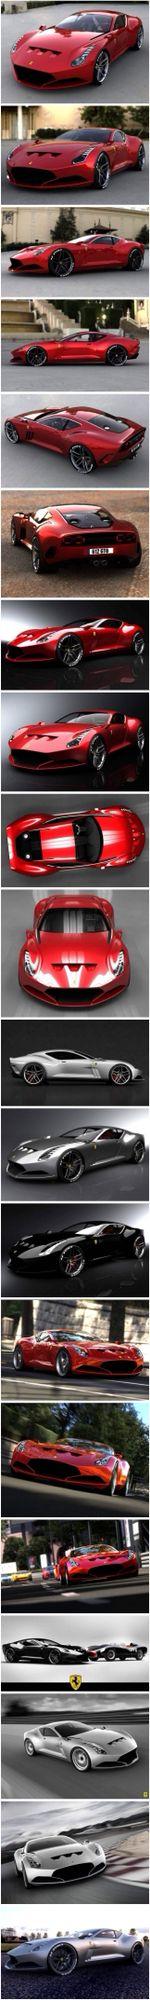 Ferrari 612 GTO - Concept Car